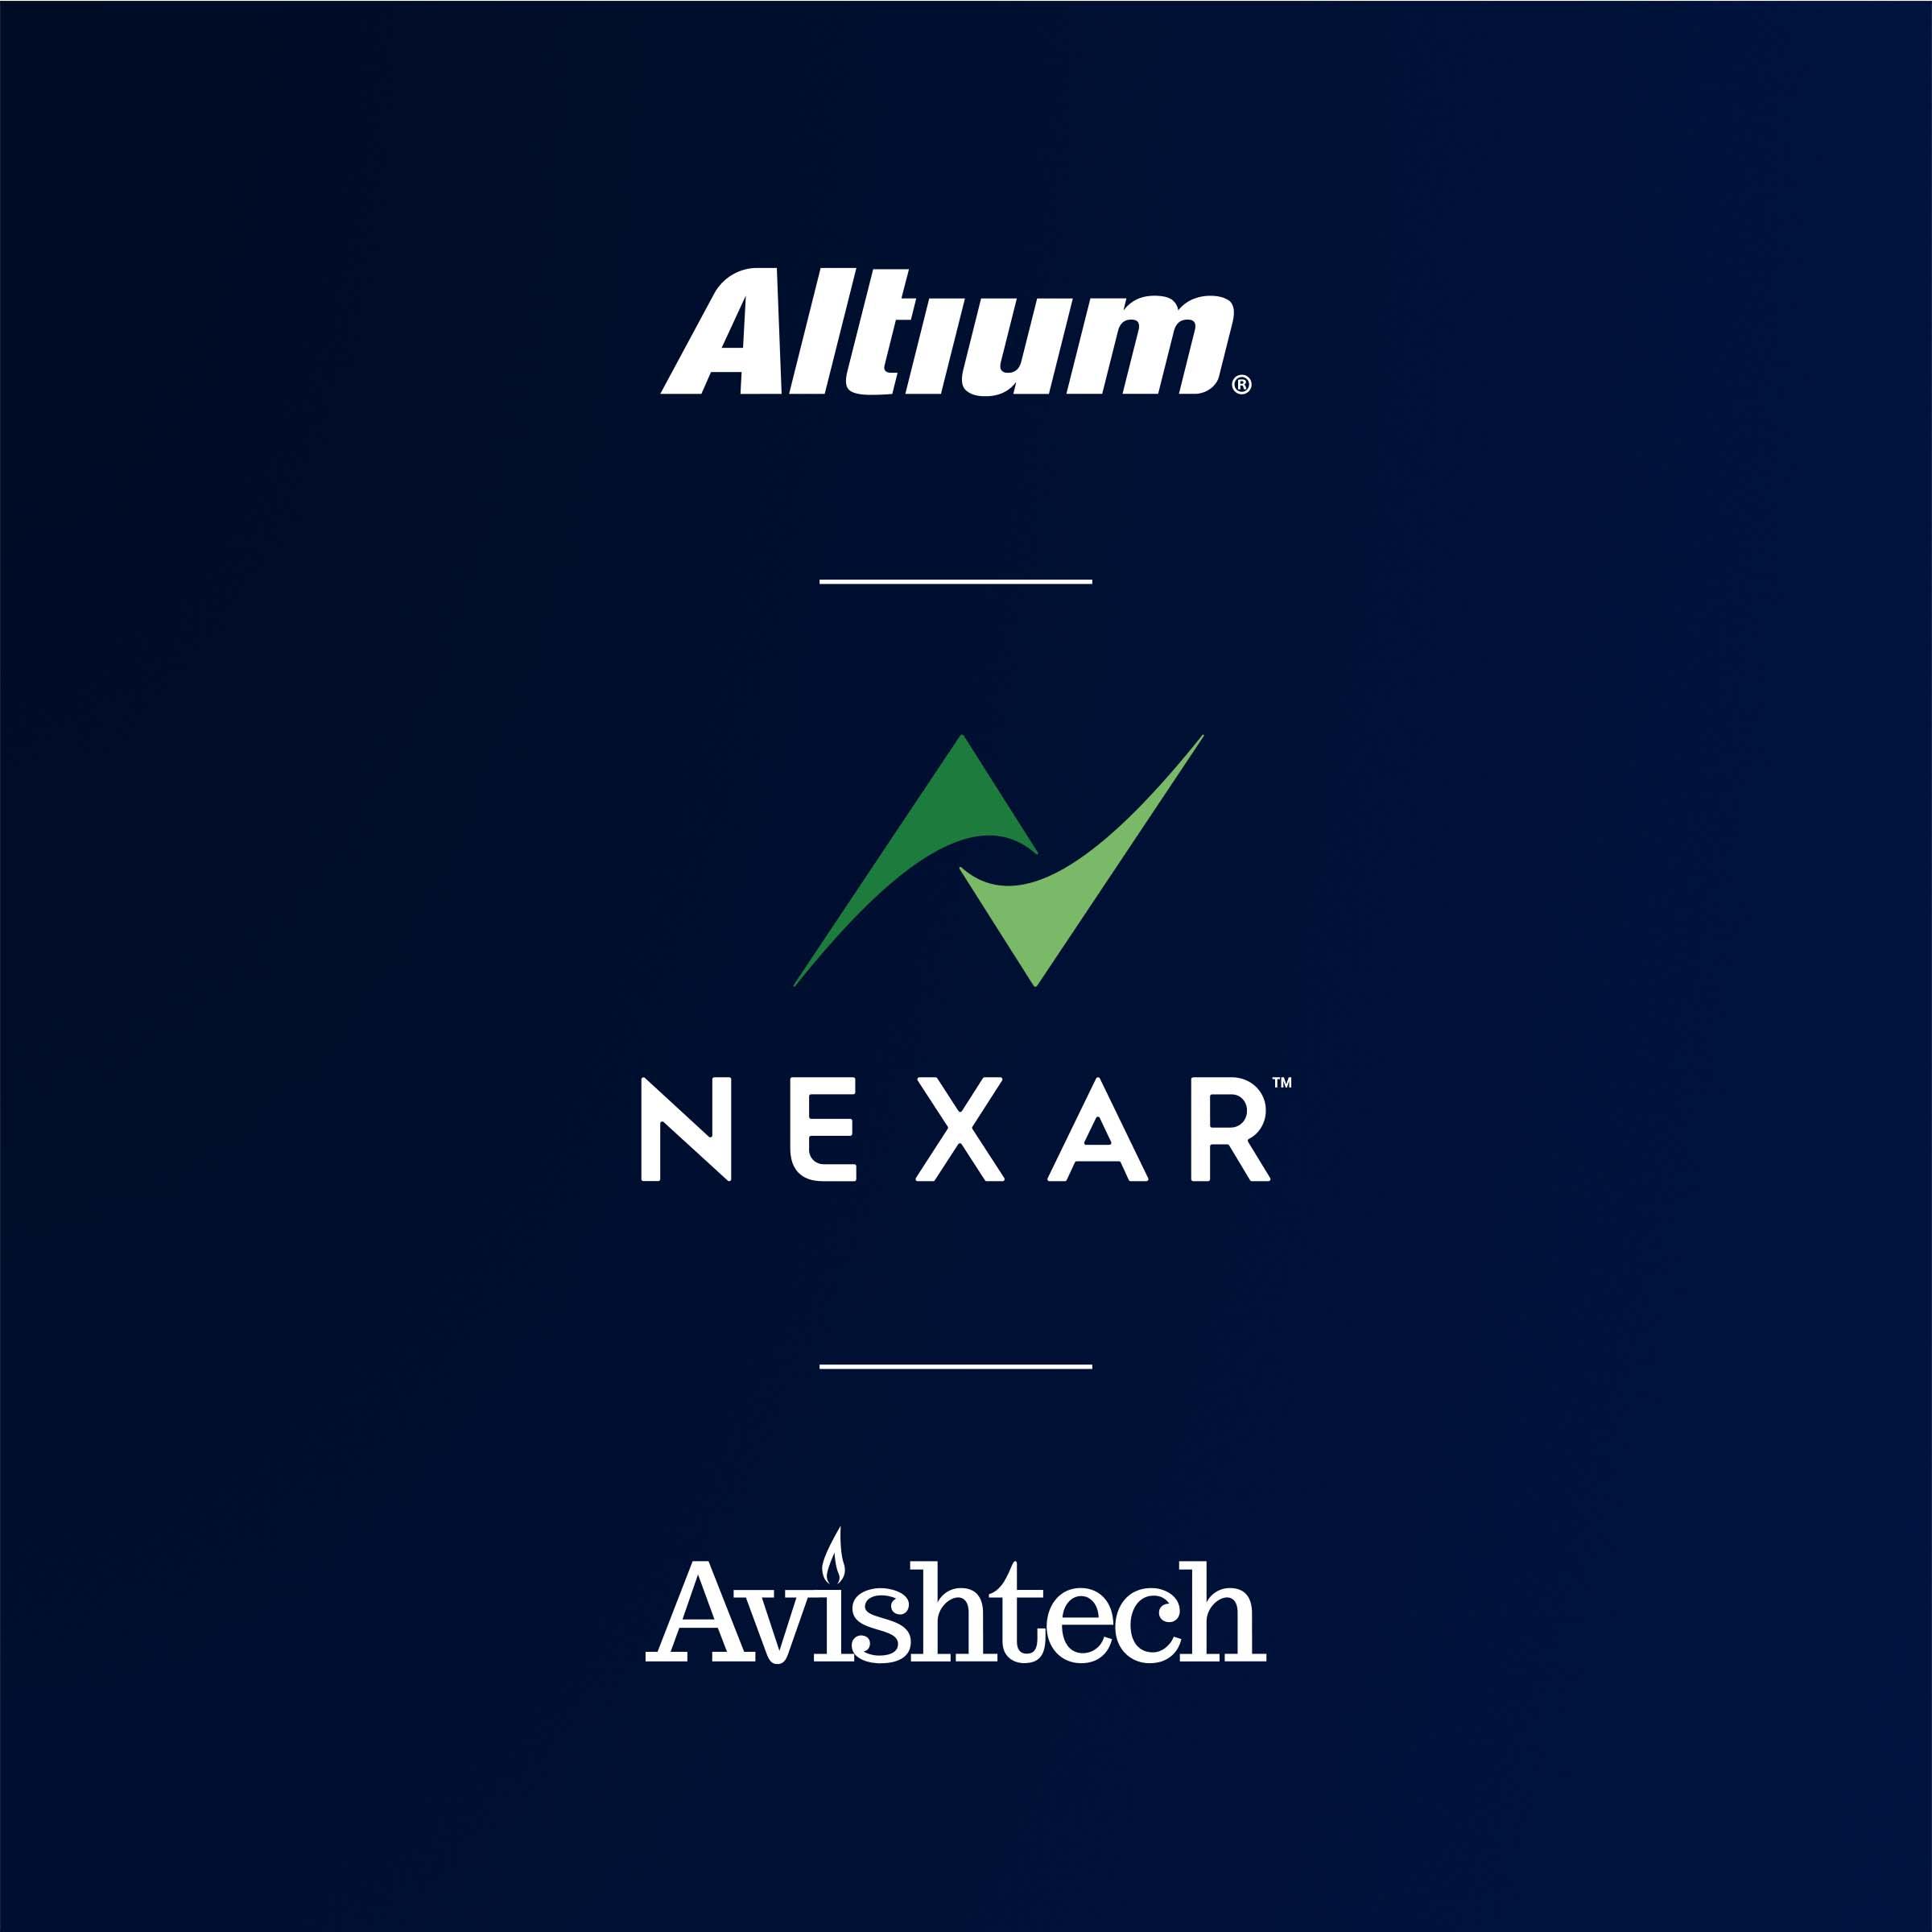 Avishtech To Join Altium's Nexar Partner Ecosystem